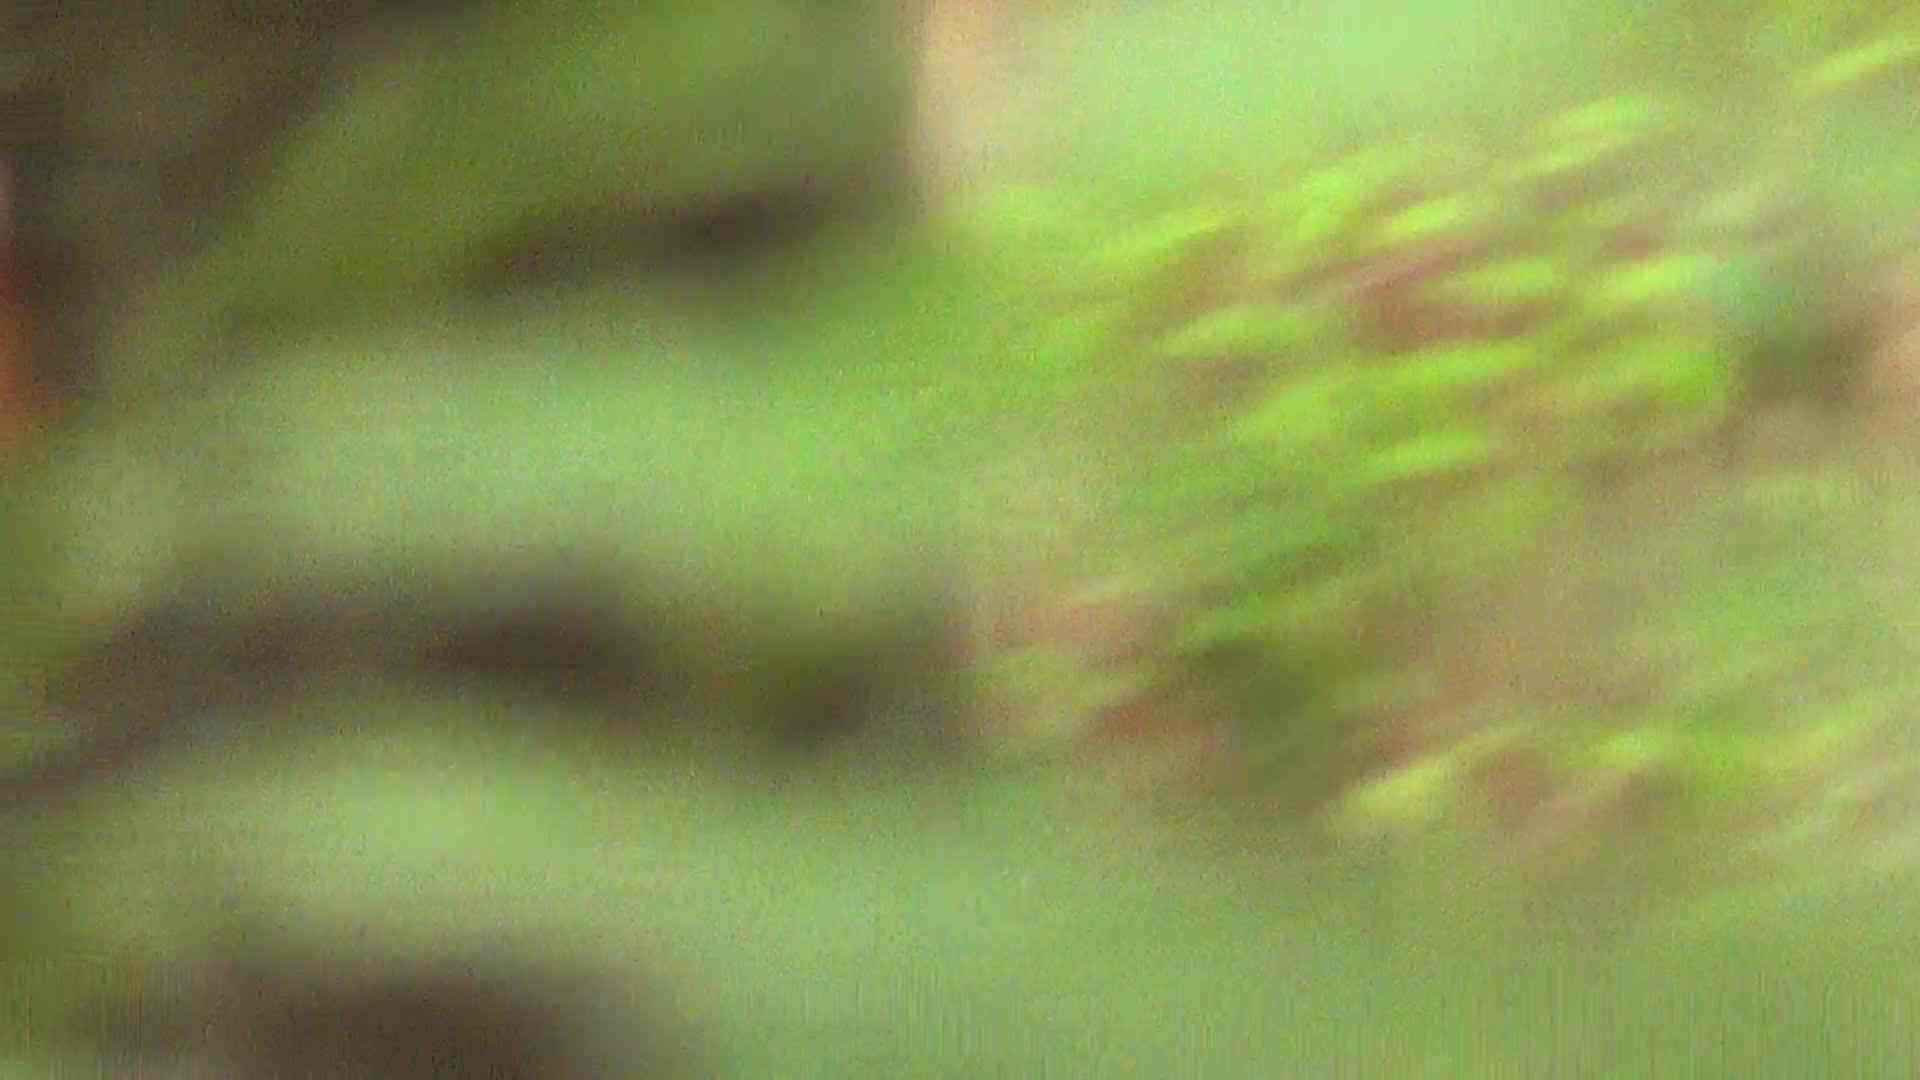 Aquaな露天風呂Vol.247 露天 オマンコ動画キャプチャ 106画像 74